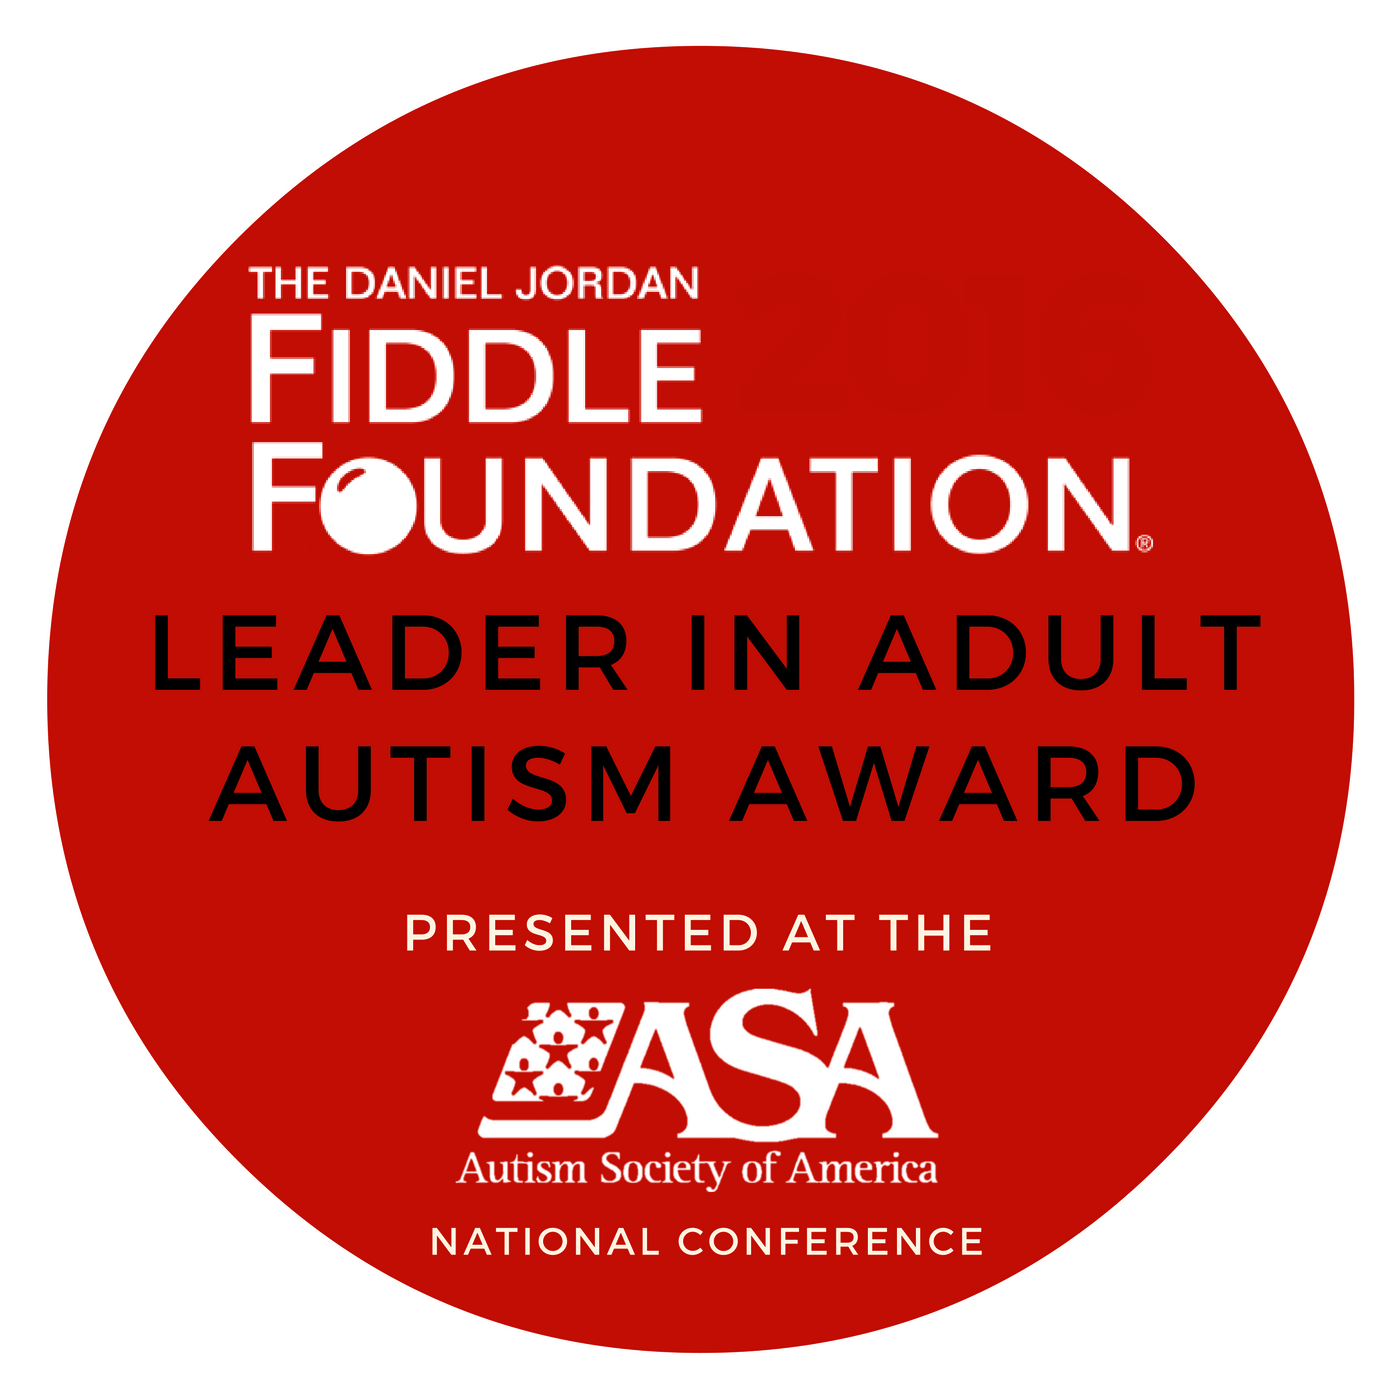 The Daniel Jordan Fiddle Foundation Leader in Adult Autism Award